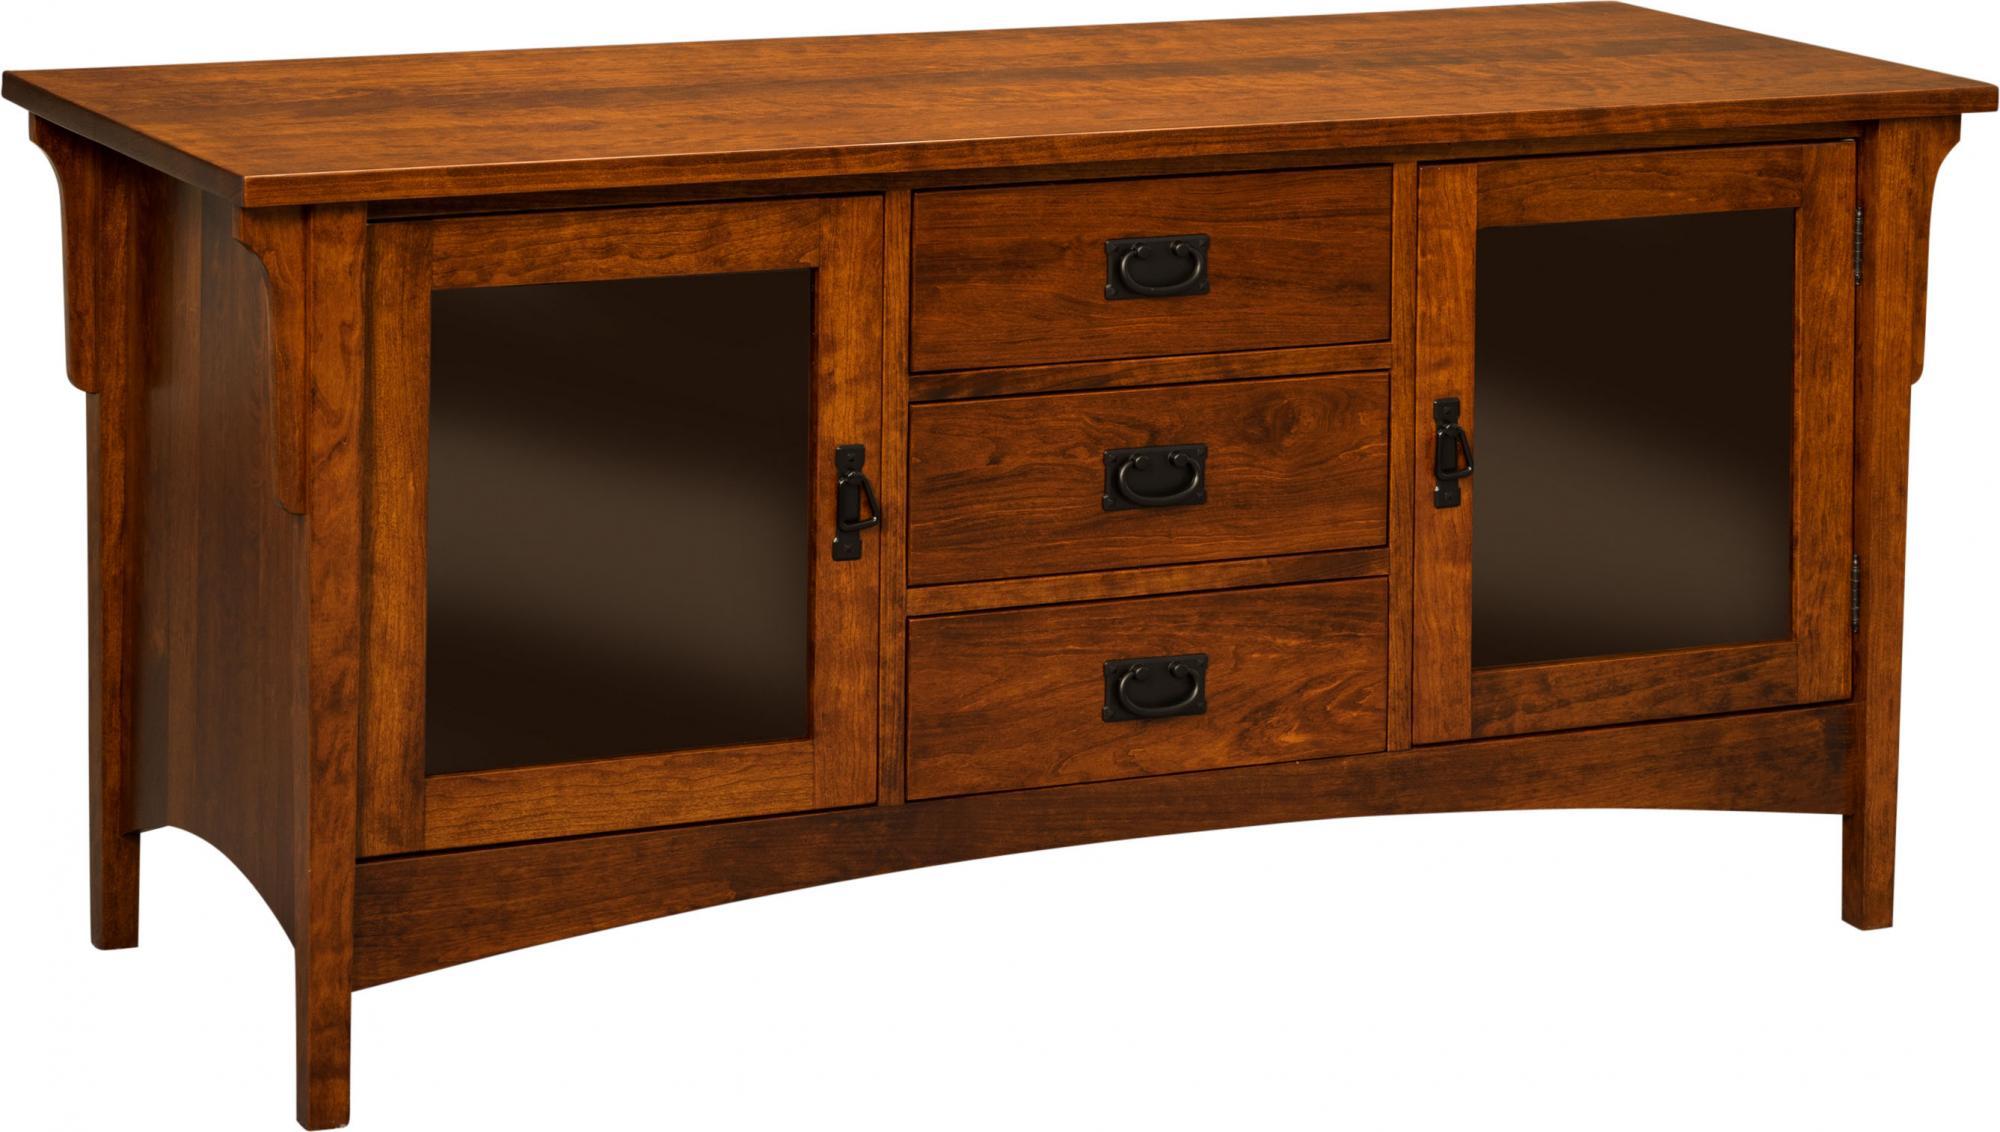 arts crafts tv stand amish furniture store mankato mn. Black Bedroom Furniture Sets. Home Design Ideas